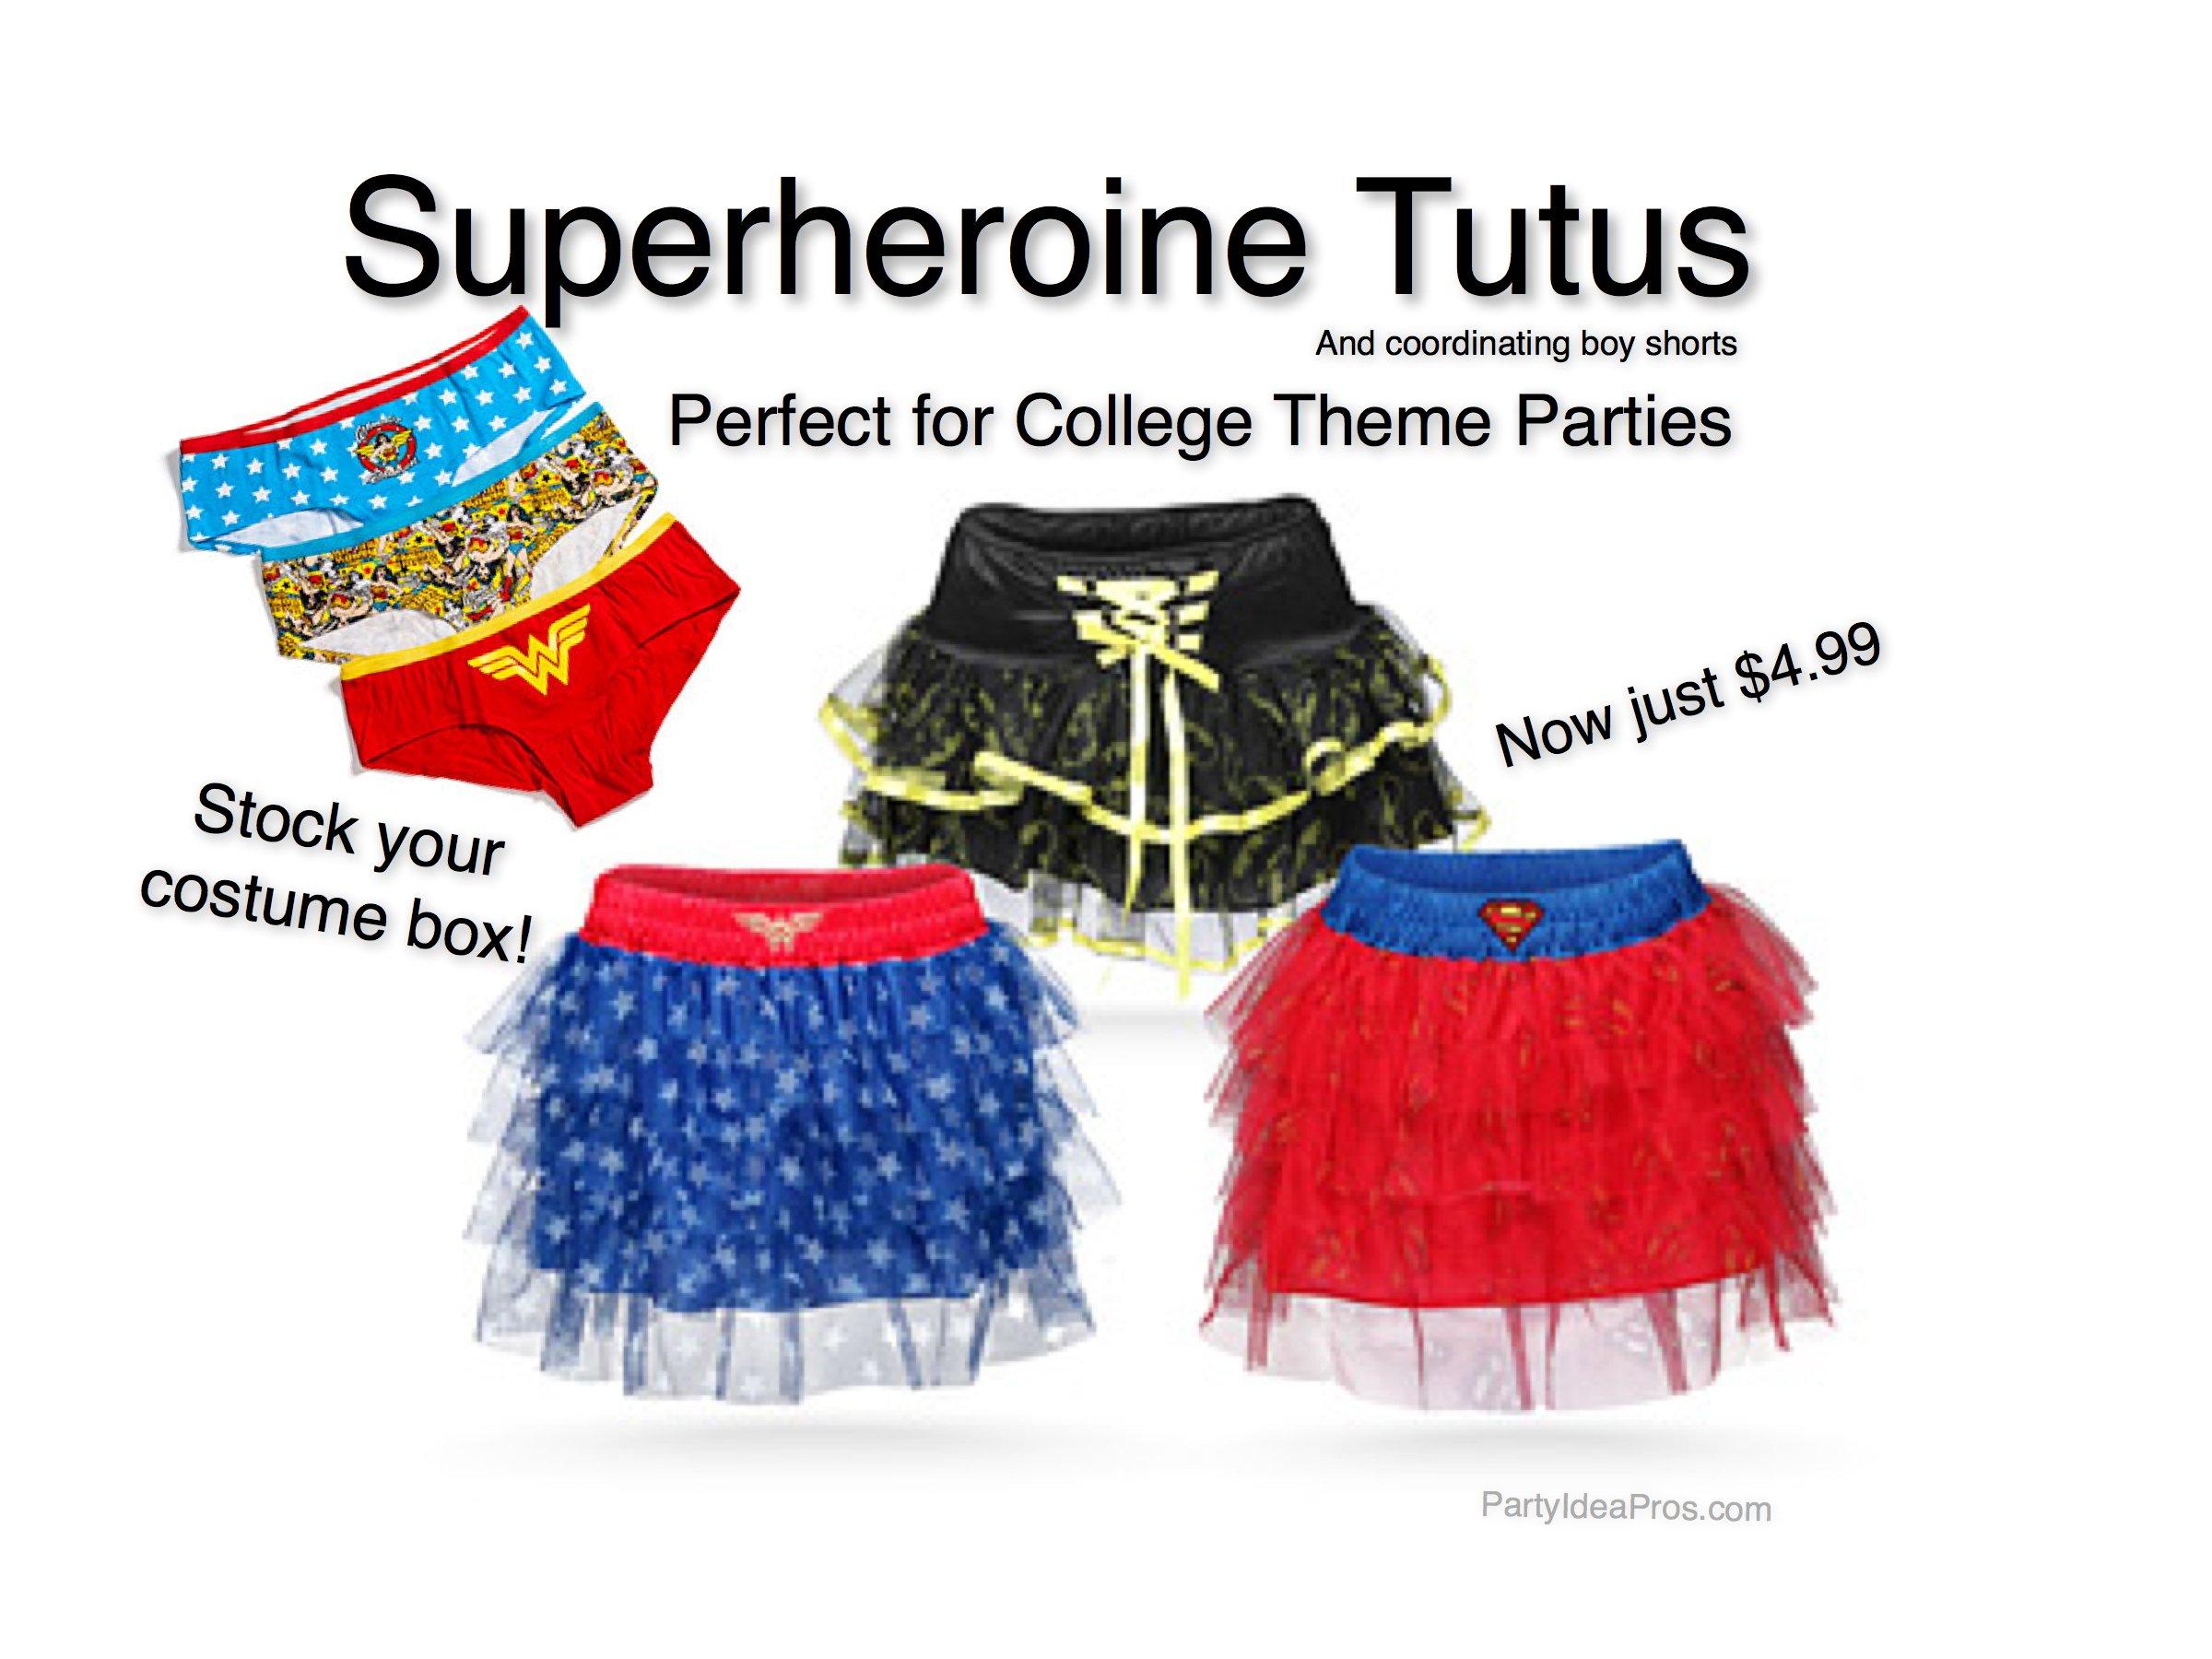 Superheroine Tutus